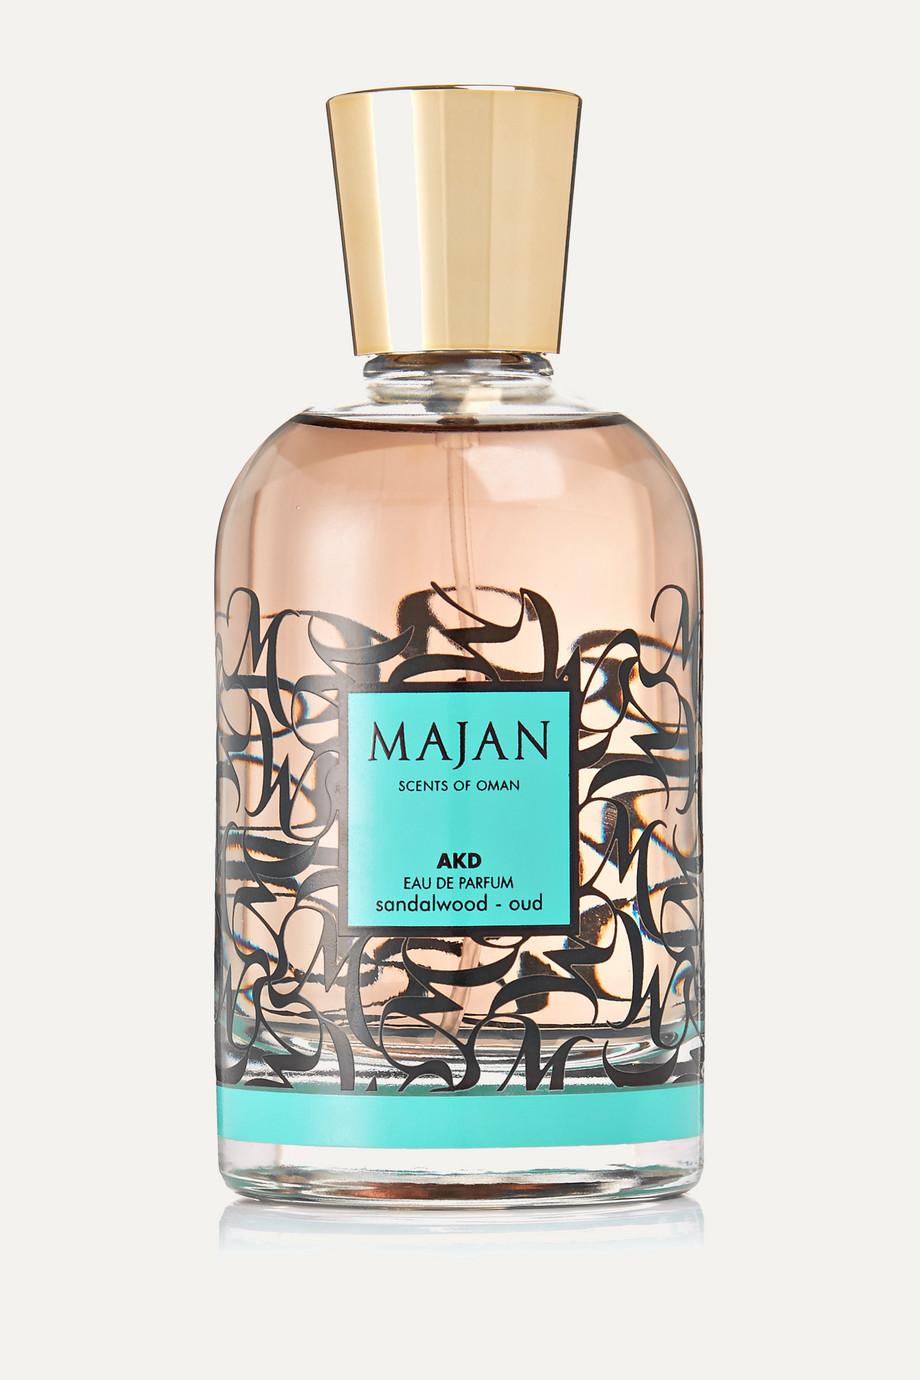 MAJAN Eau de Parfum AKD, 100 ml